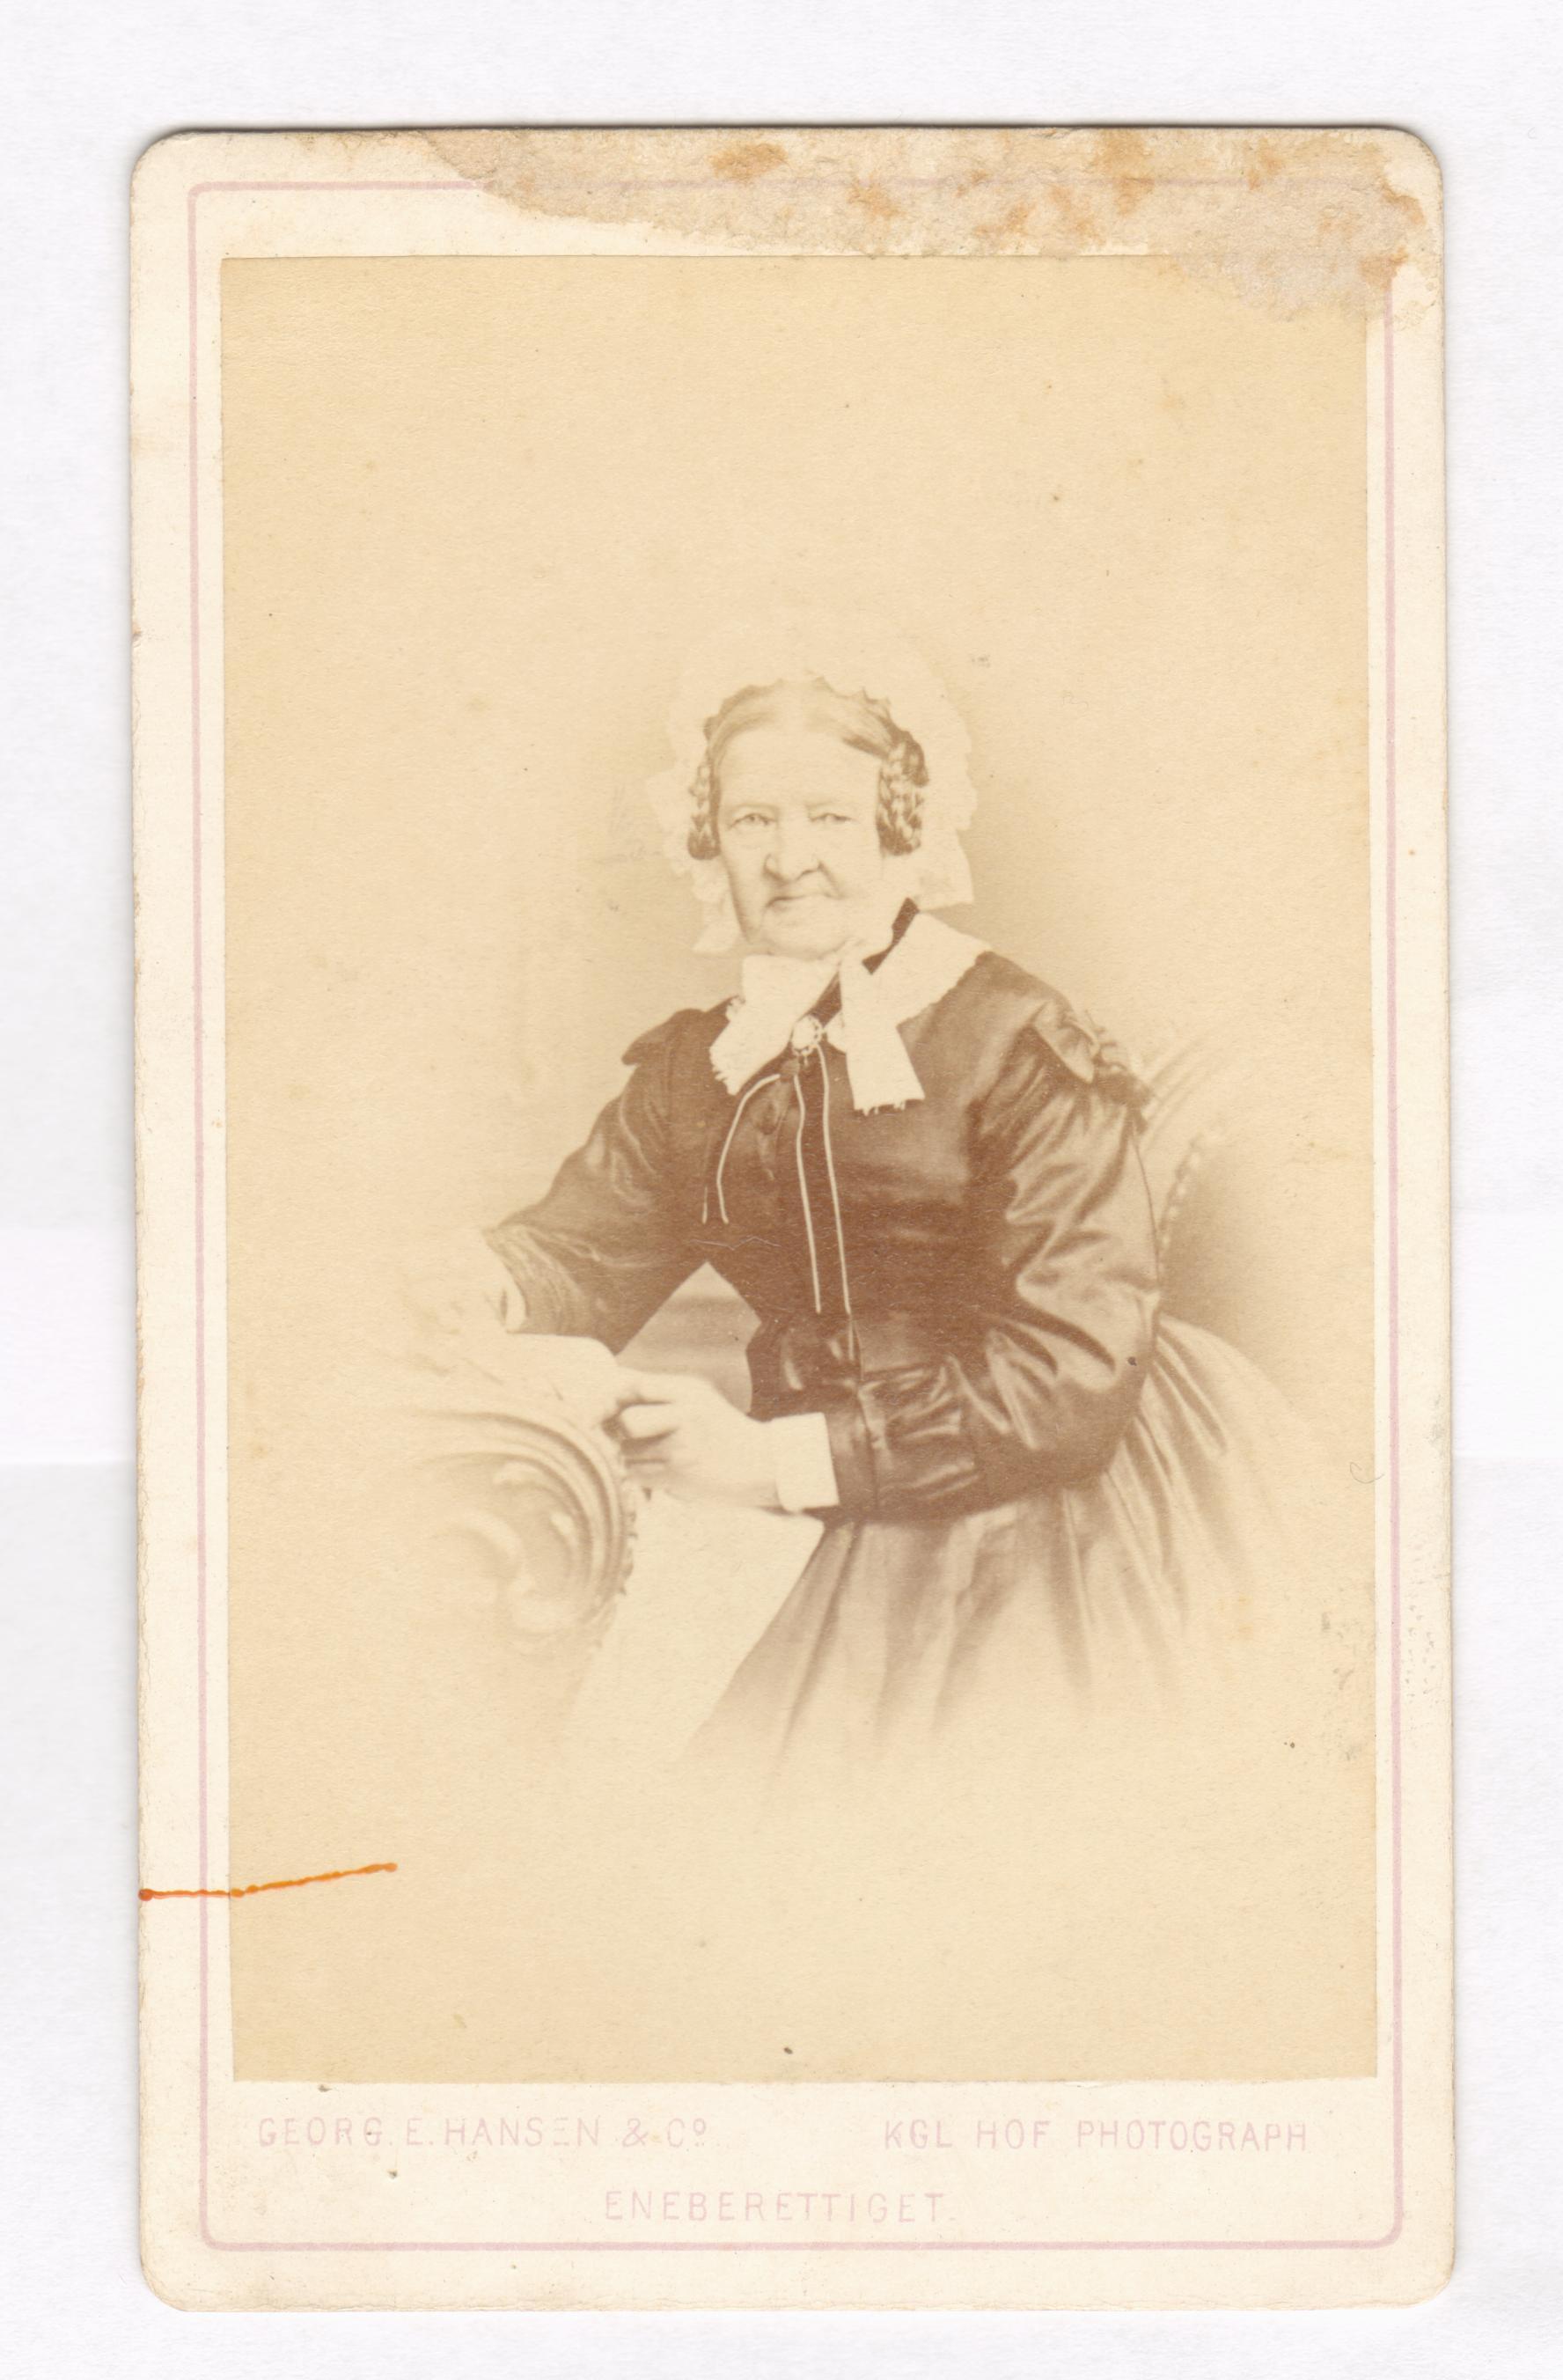 75.70  Sophie Cathrine Quist f. 31.12 1808, gift 26.11 1823 med Ferdinand Felix Borch, skomagermester.  Fotograf Georg E. Hansen, Bredgade 22/ Norgesgade 61, København